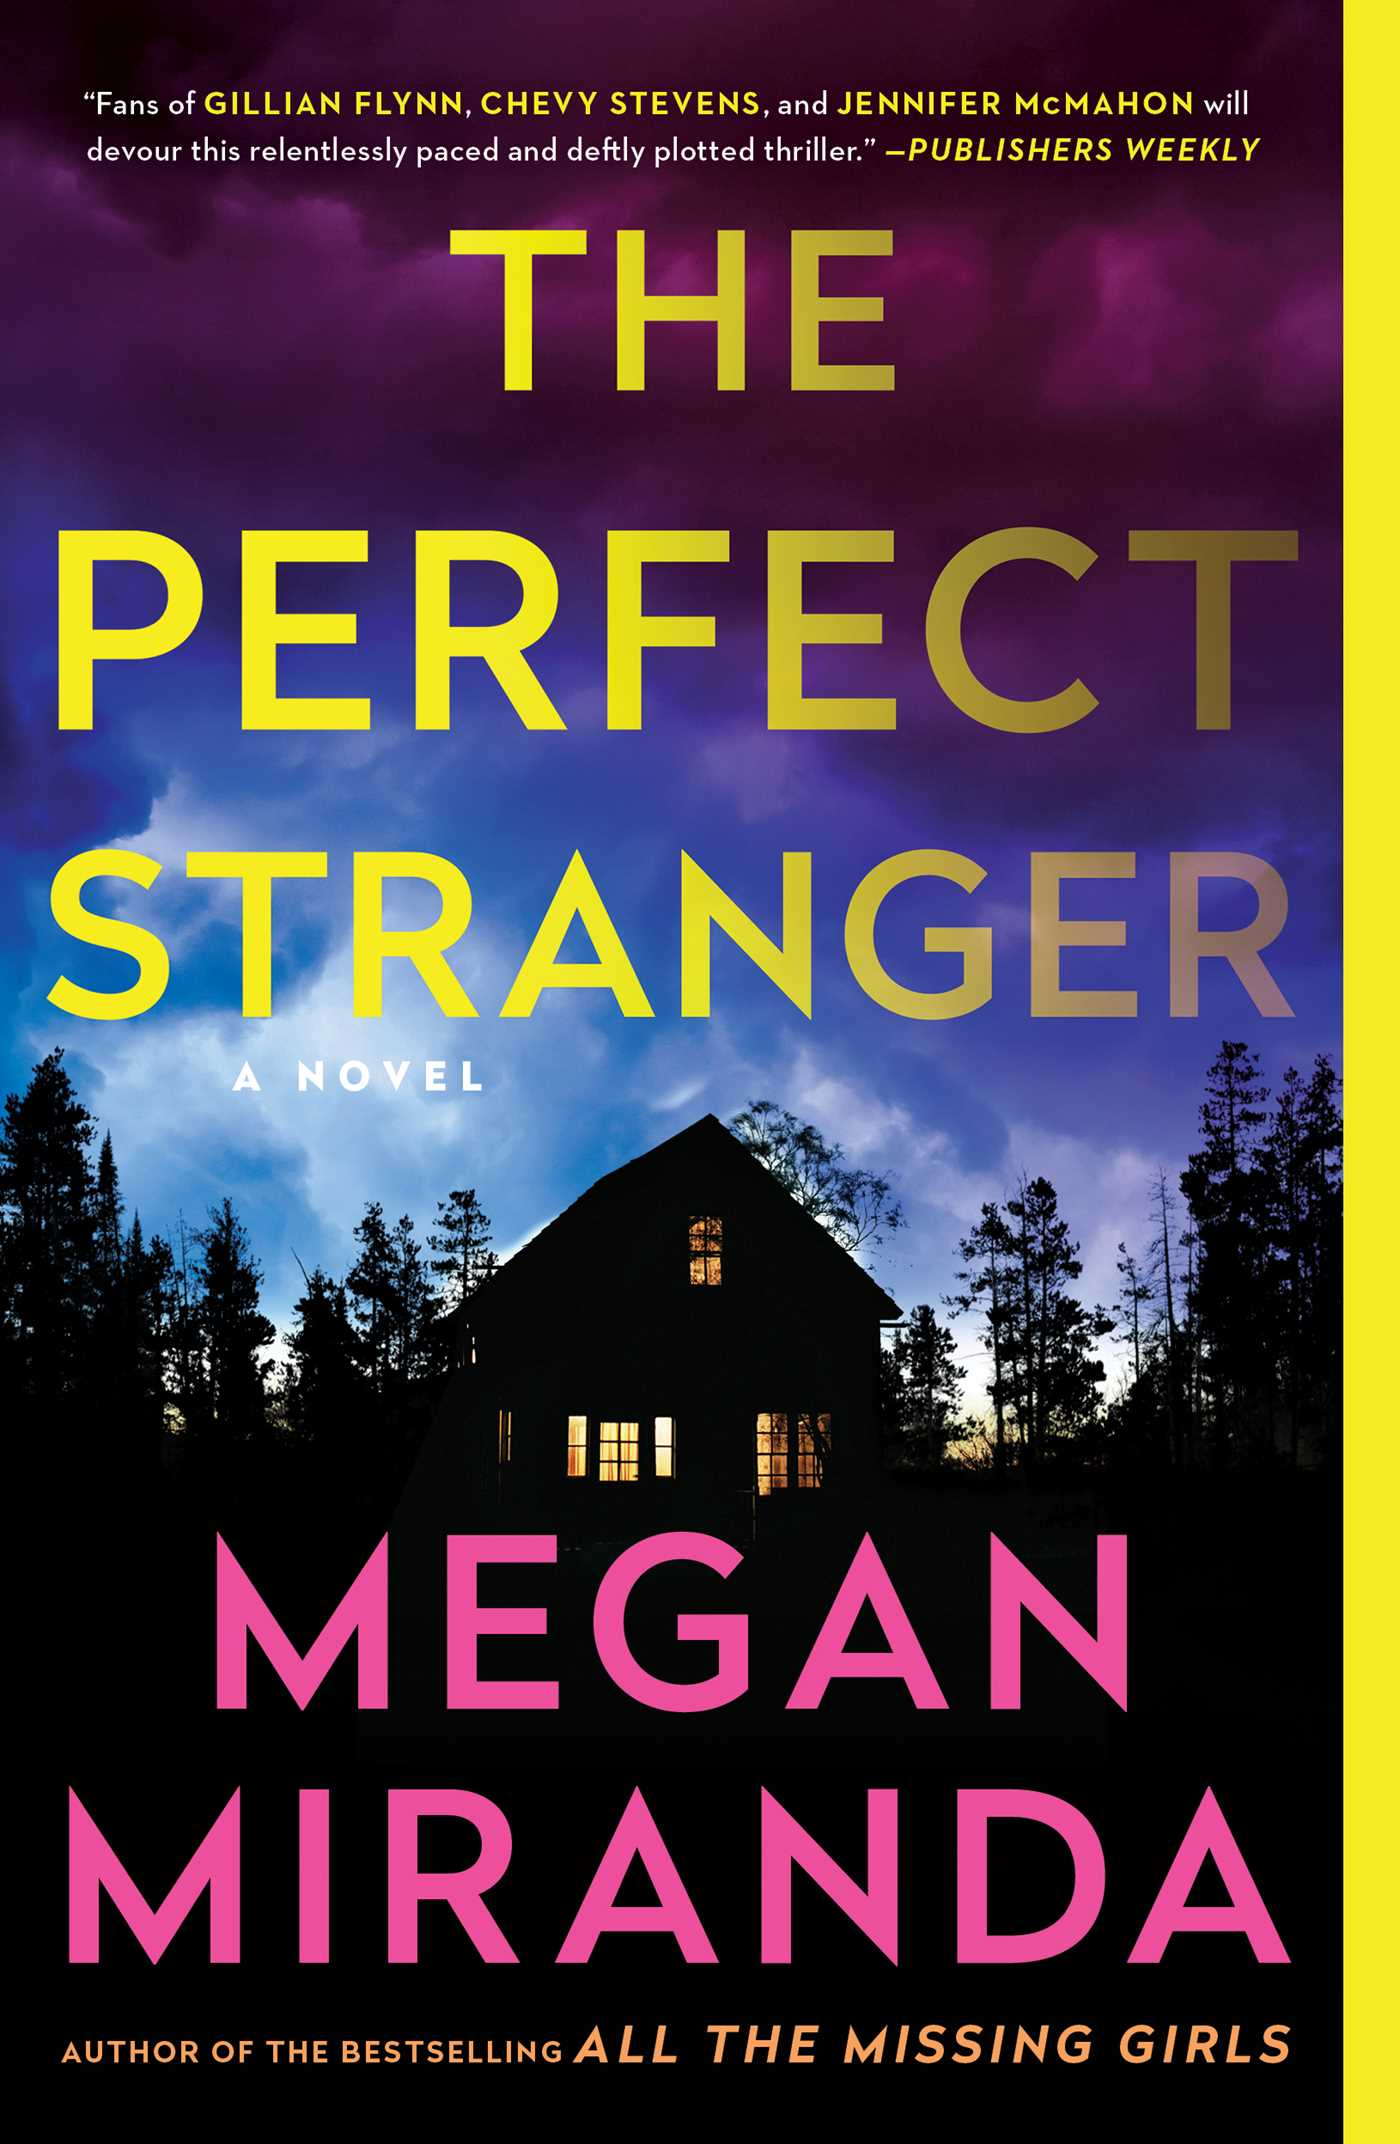 The perfect stranger 9781501108006 hr